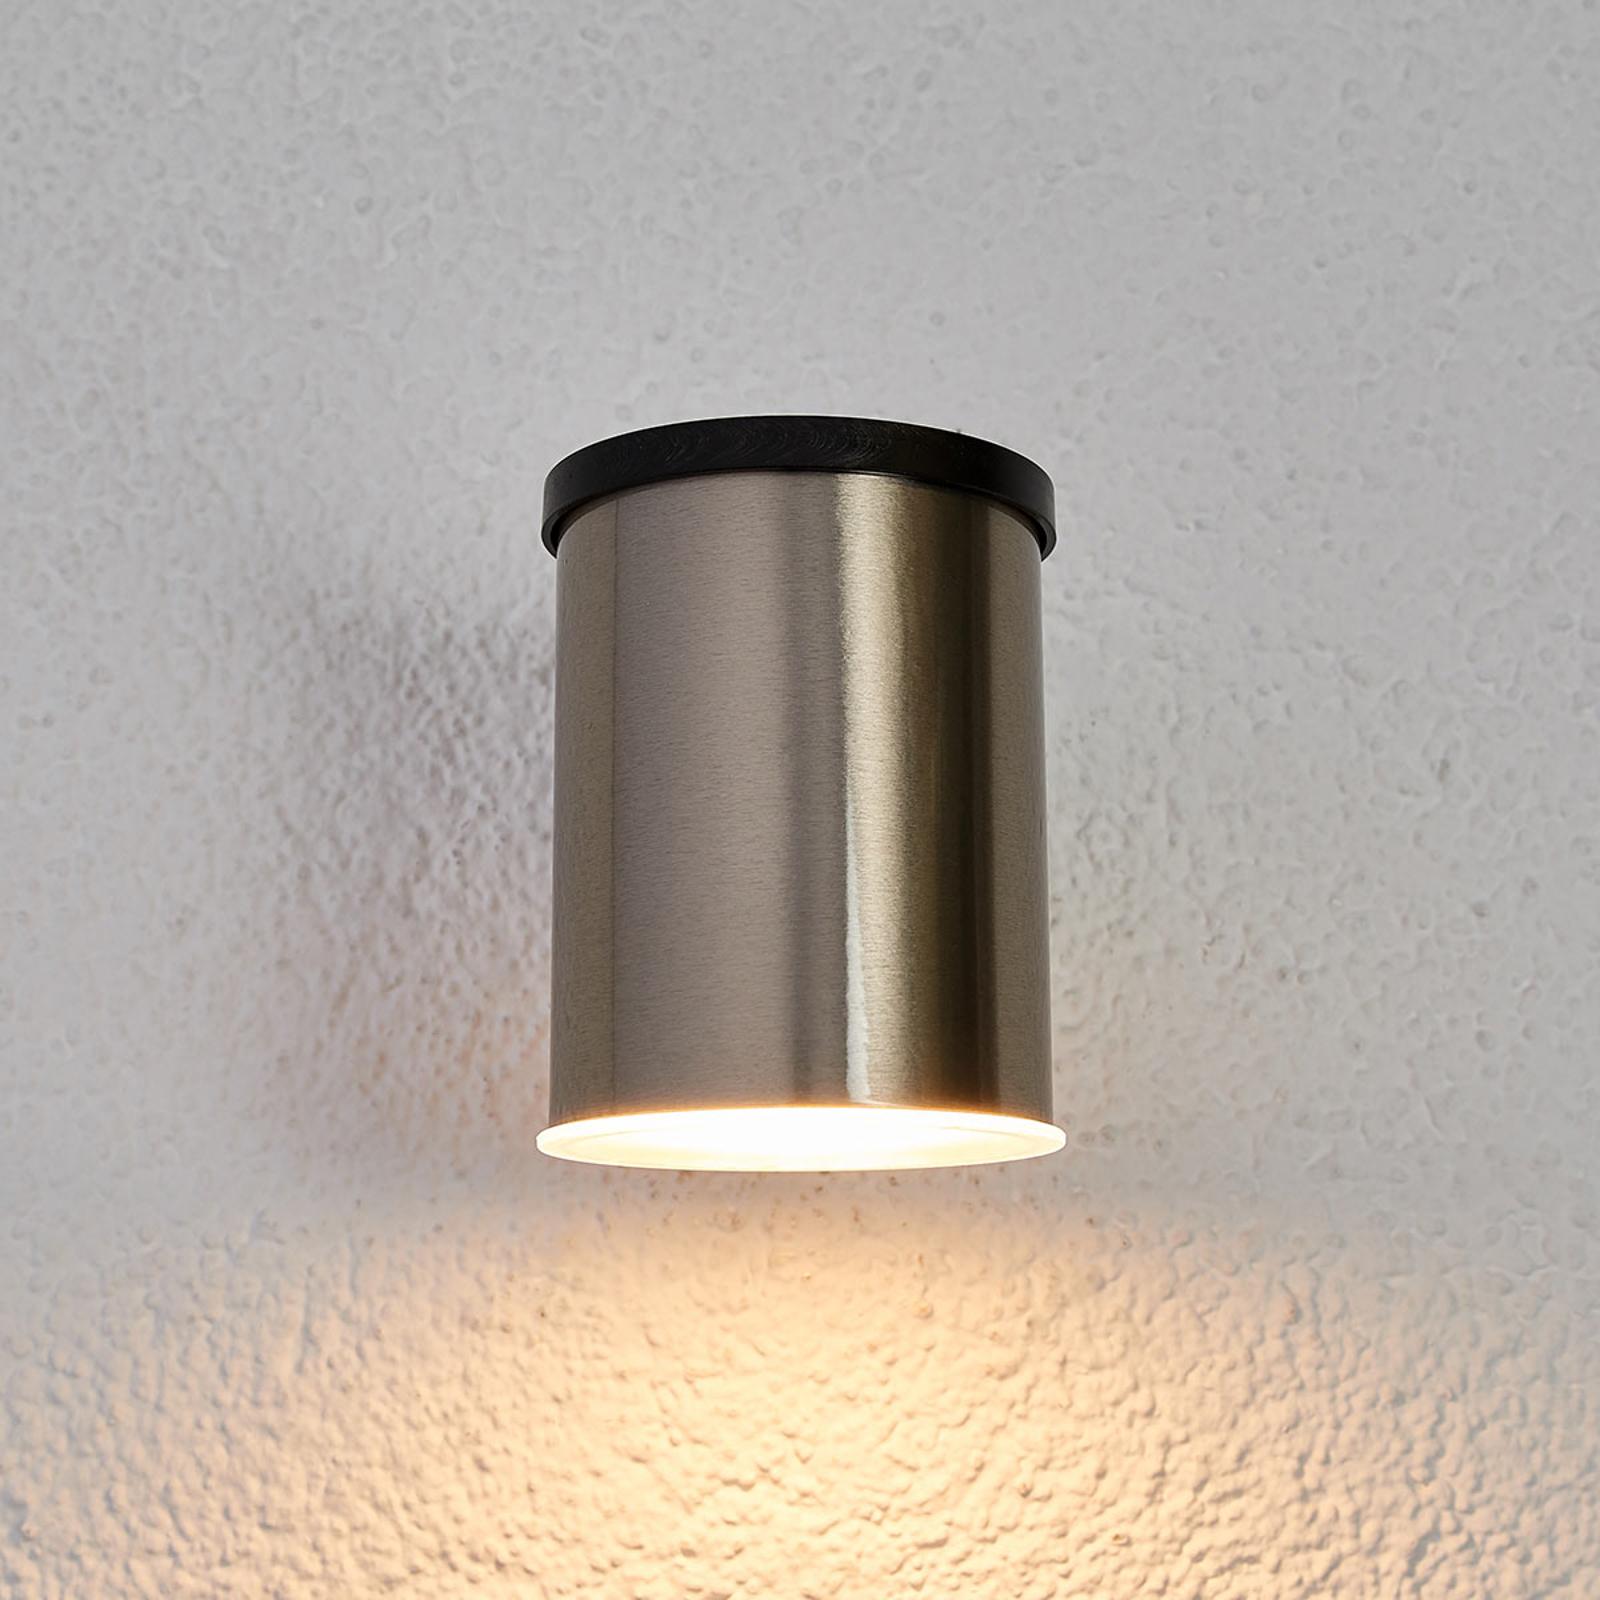 LED wandlamp zonne-energie Tyson, rond, helder